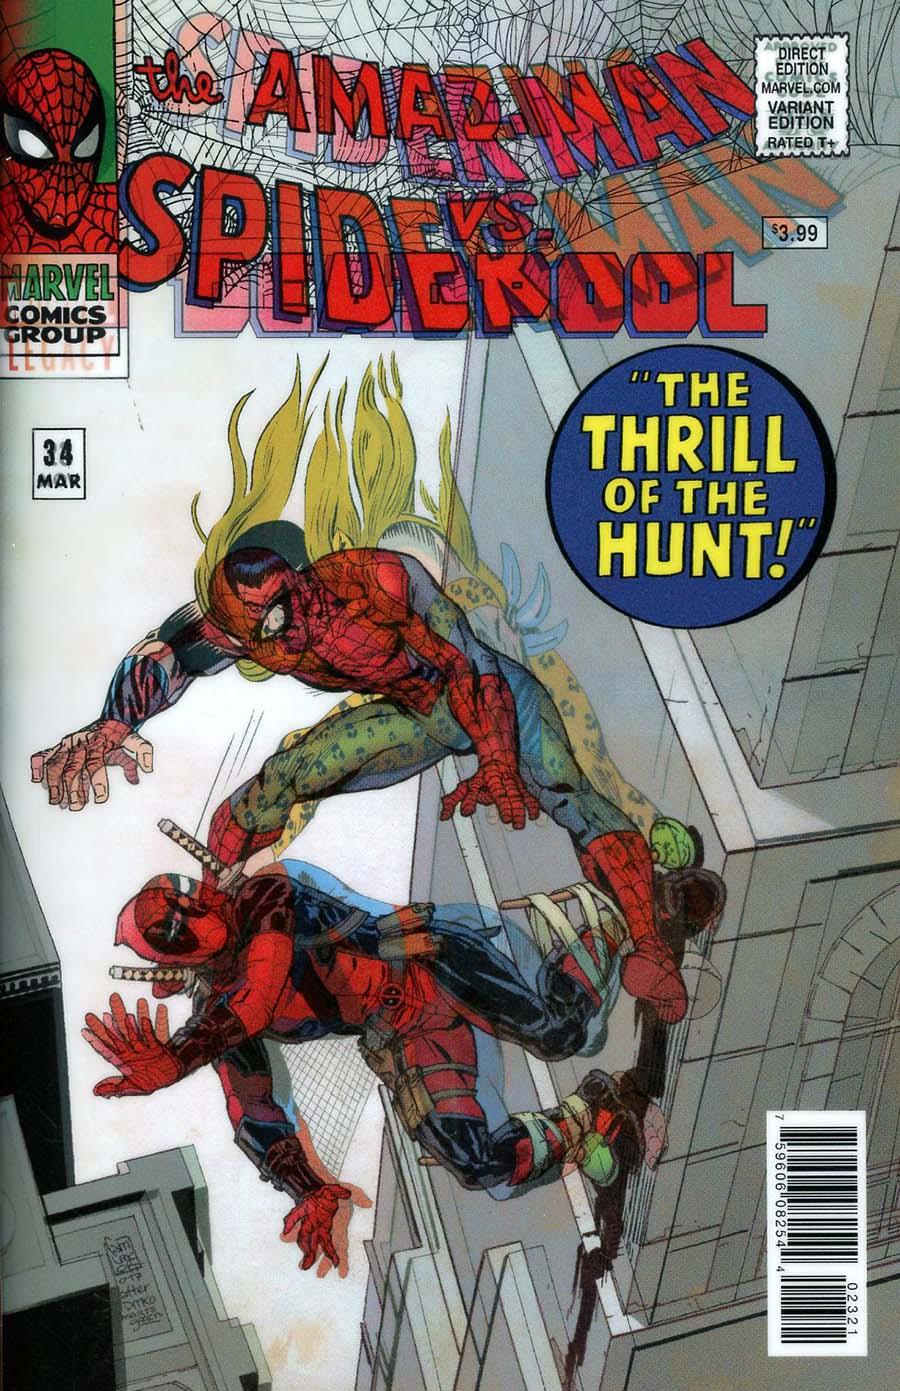 Spider-Man Deadpool #23 Cover B Variant Giuseppe Camuncoli Lenticular Homage Cover (Marvel Legacy Tie-In)